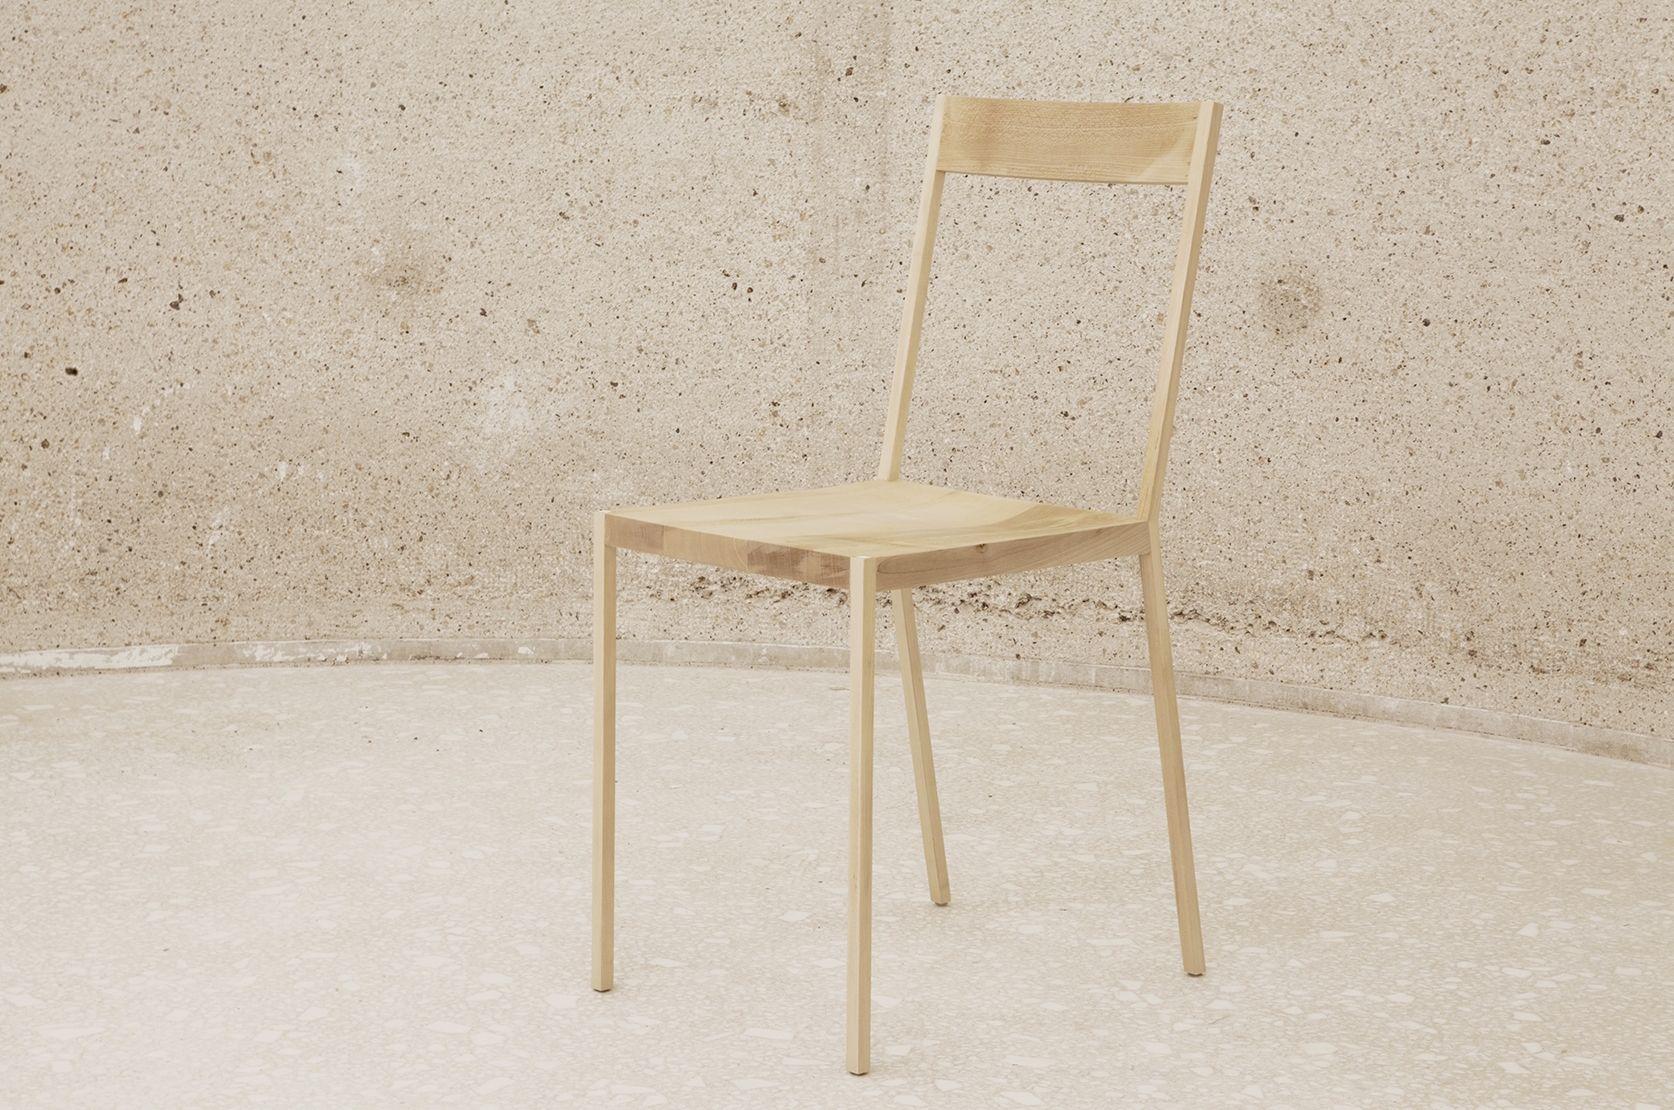 Lambert Collection Avignon Chaise Chair